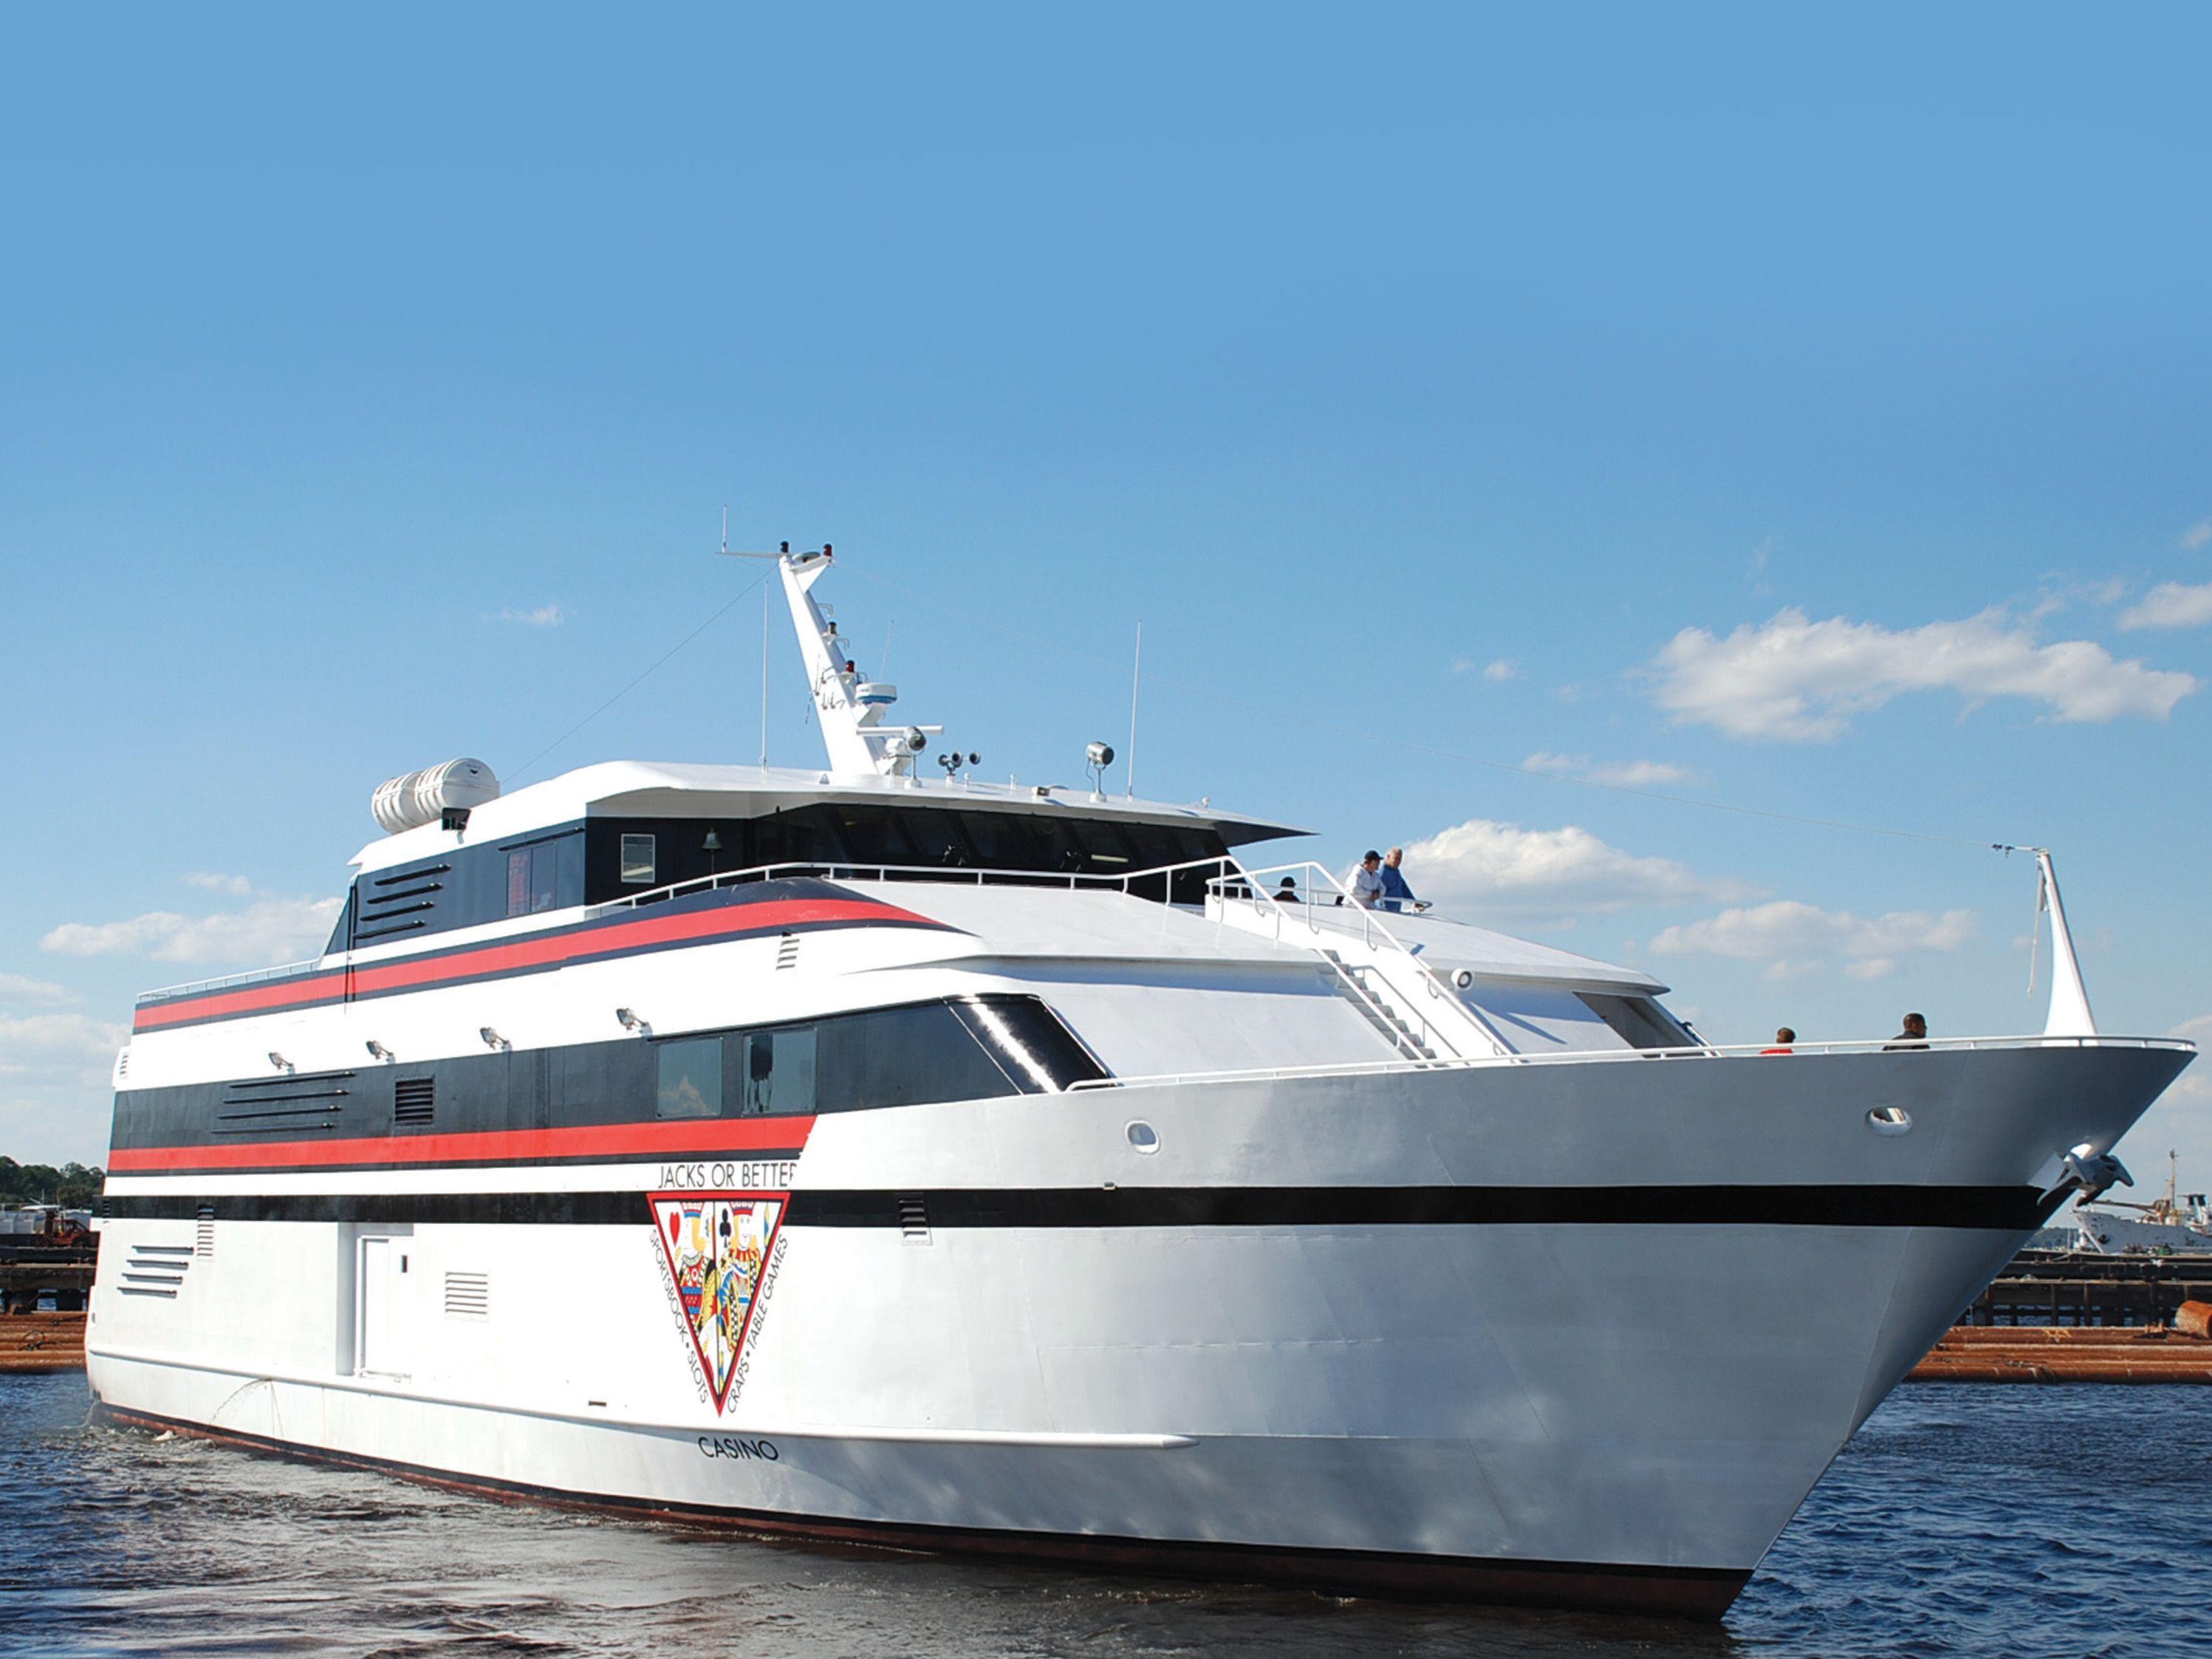 0717 icehouse casino boat gxs5mi